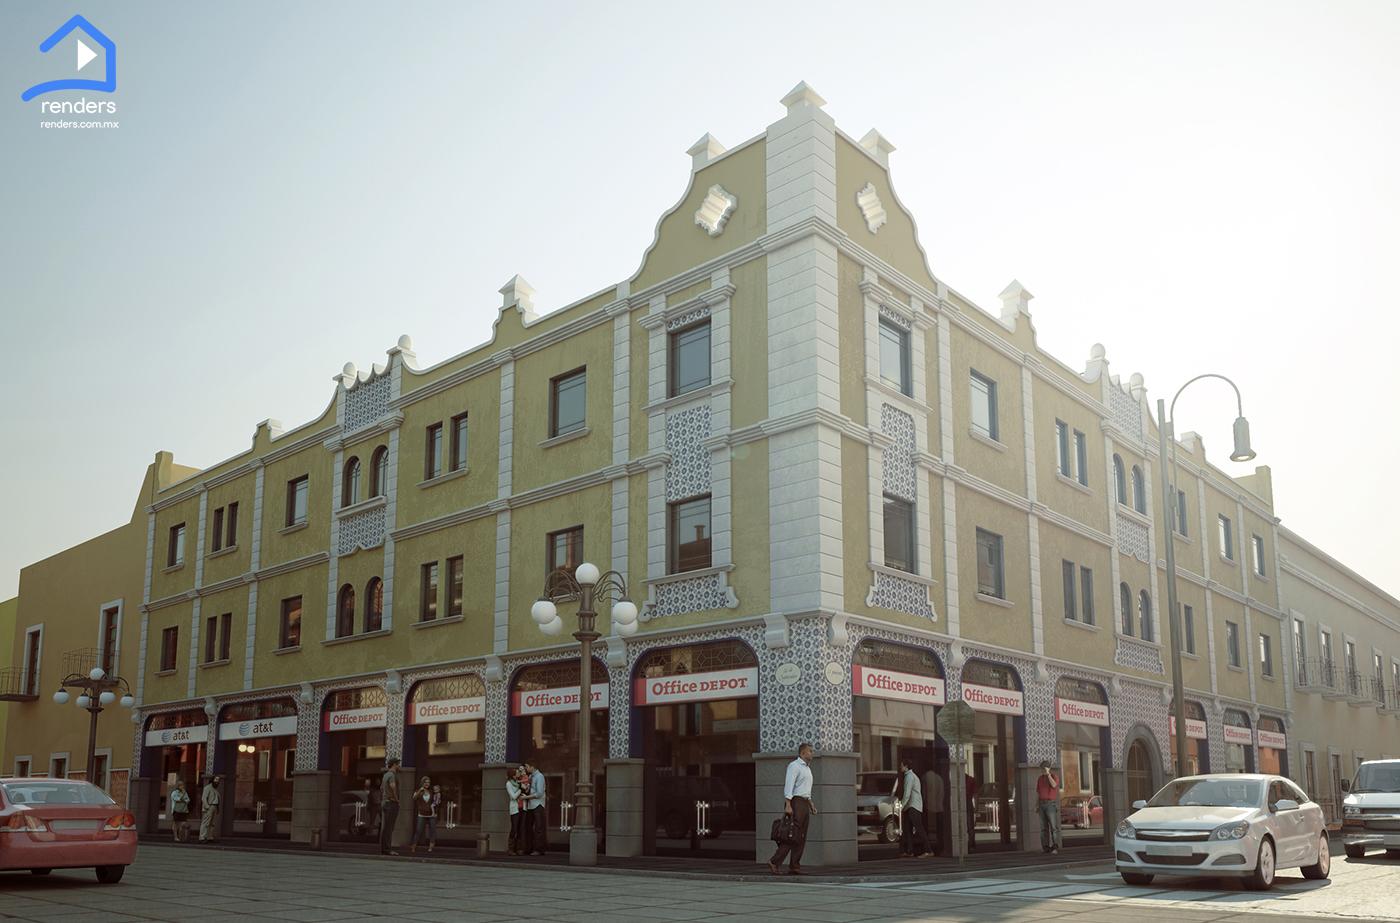 renders exteriores centro historico